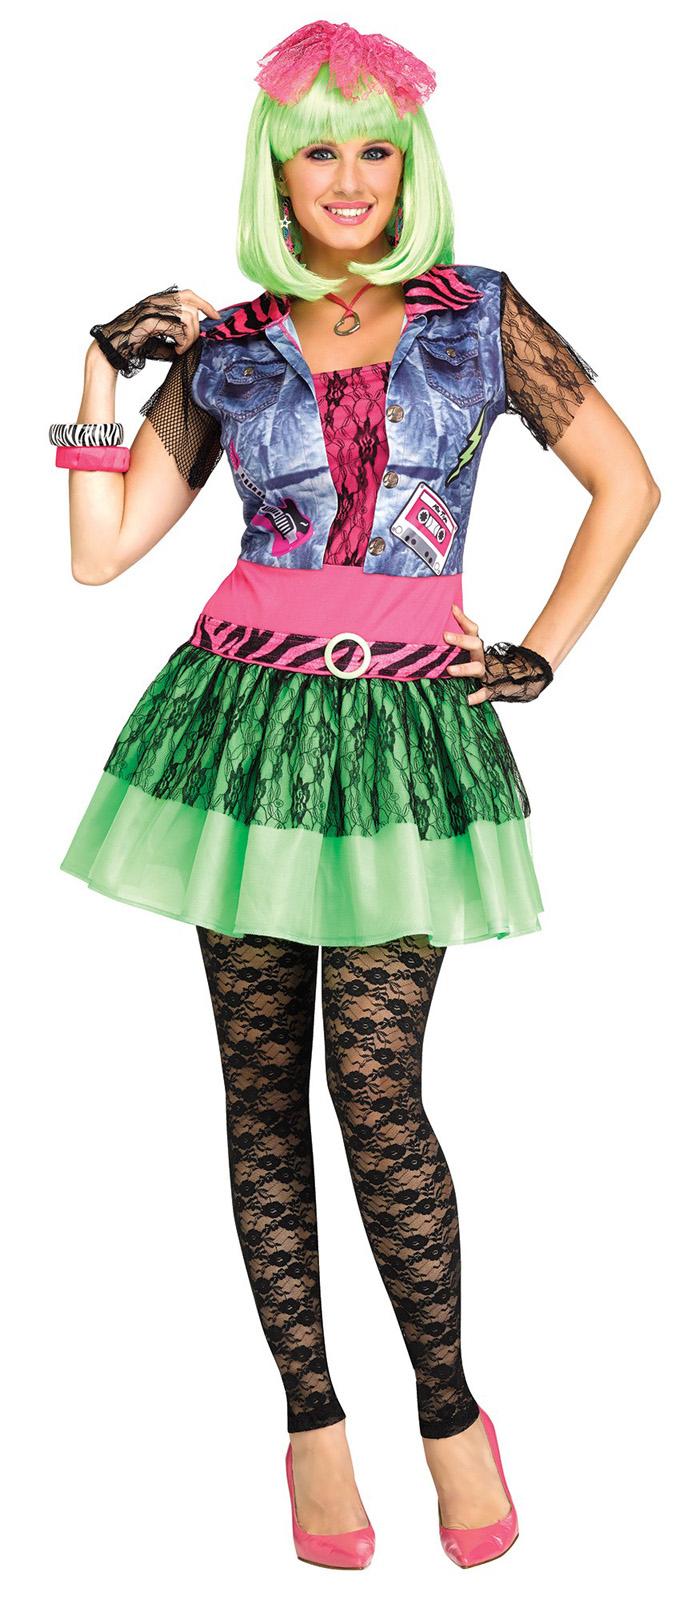 Rockin 80s Costume Dress Womens Dance Club Retro Cyndi Lauper Material Girl Lace | eBay